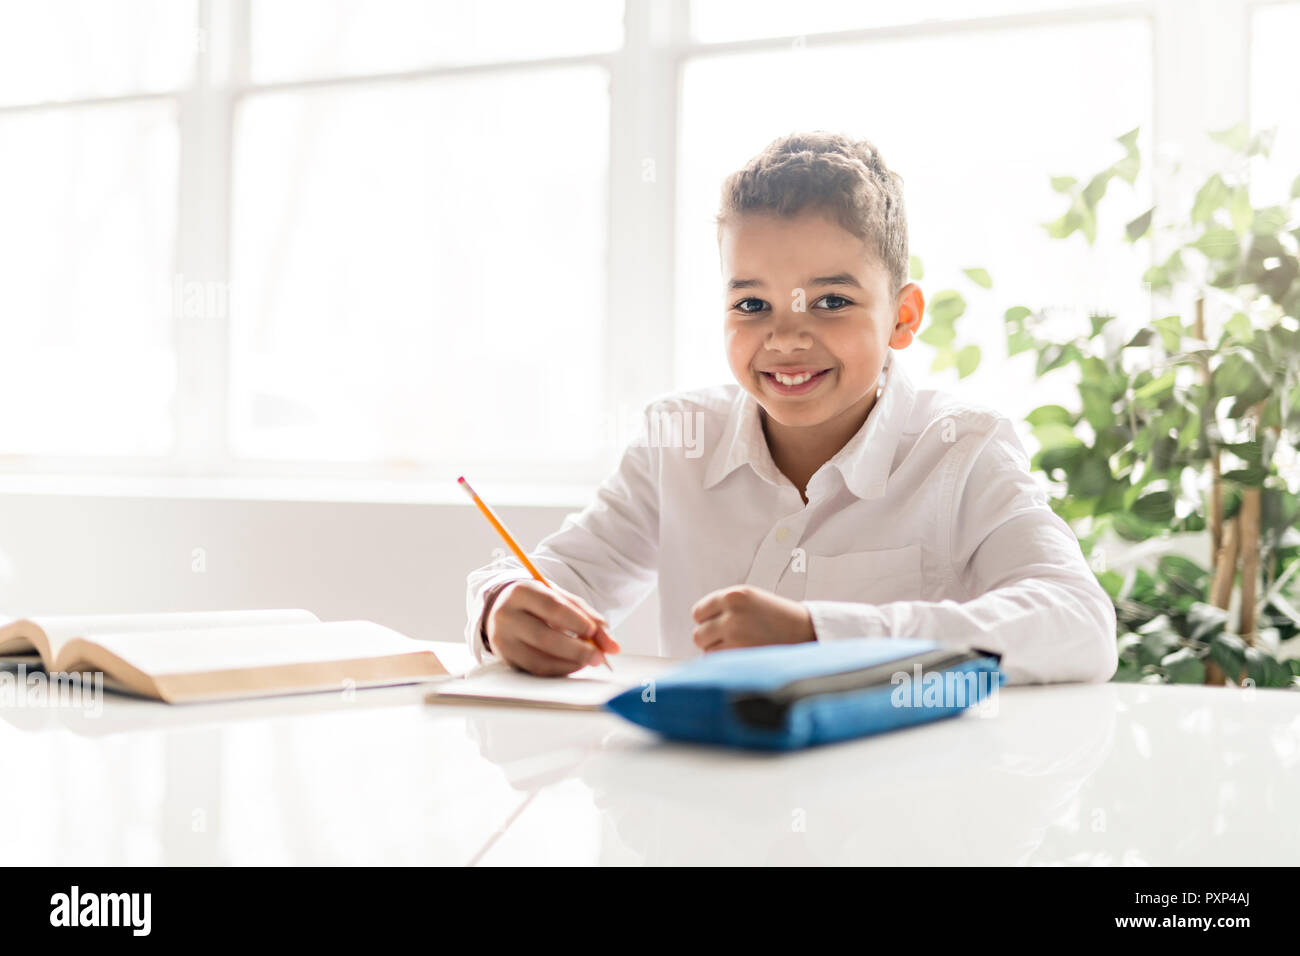 a cute black boy doing homework at home stock photo 222991850 alamy rh alamy com Doing Math Homework Doing Math Homework